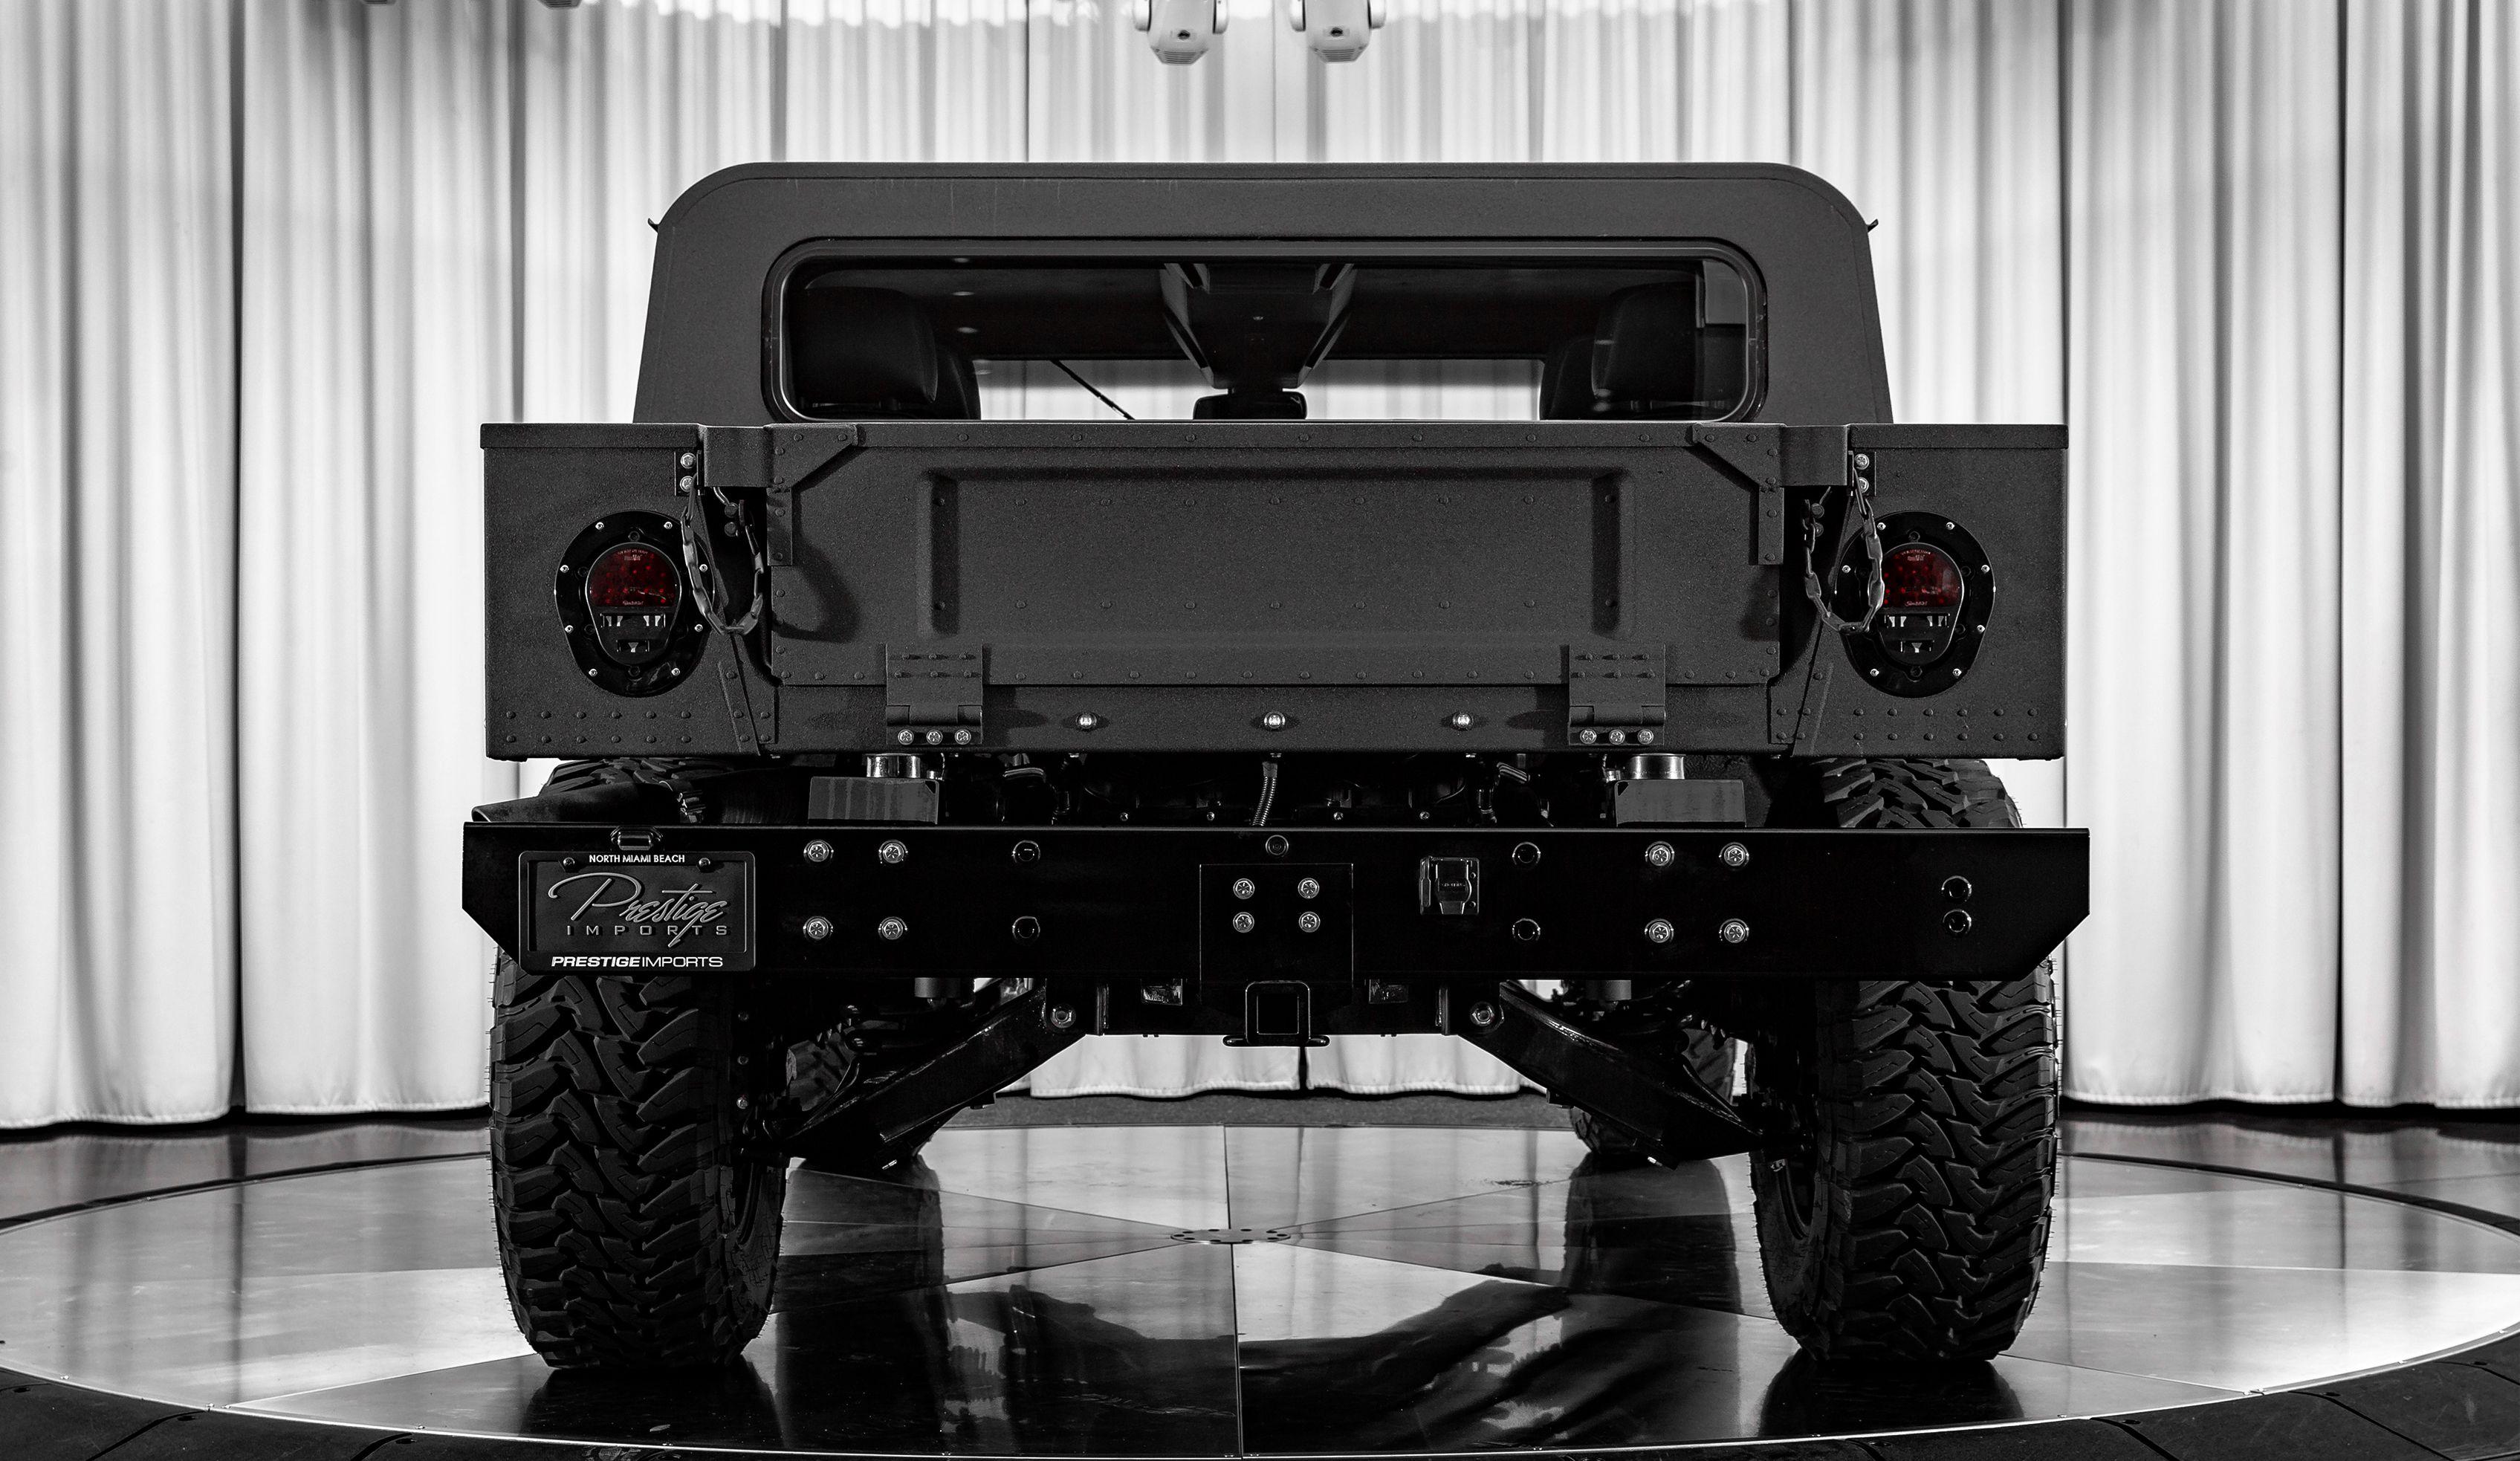 Mil-Spec-Hummer-H1-pickup-hardtot-launch-edition-2019-2